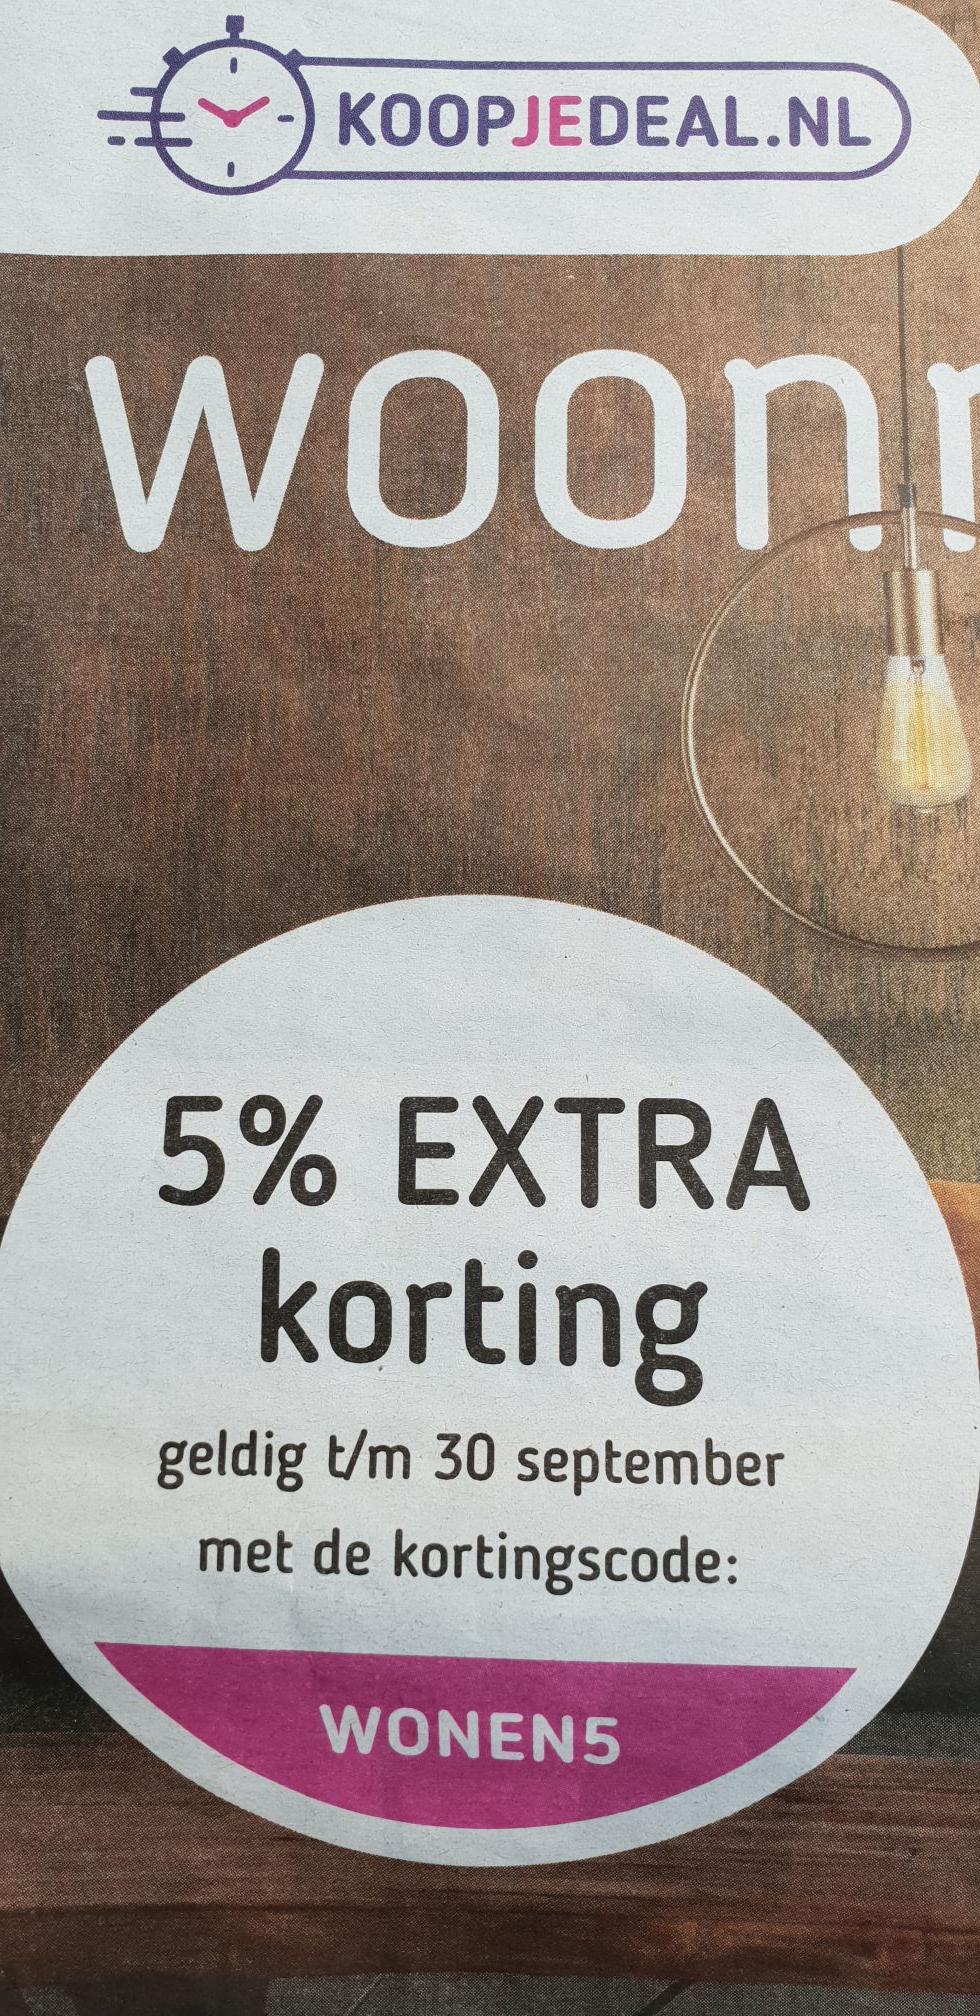 5% extra korting koopjedeal.nl